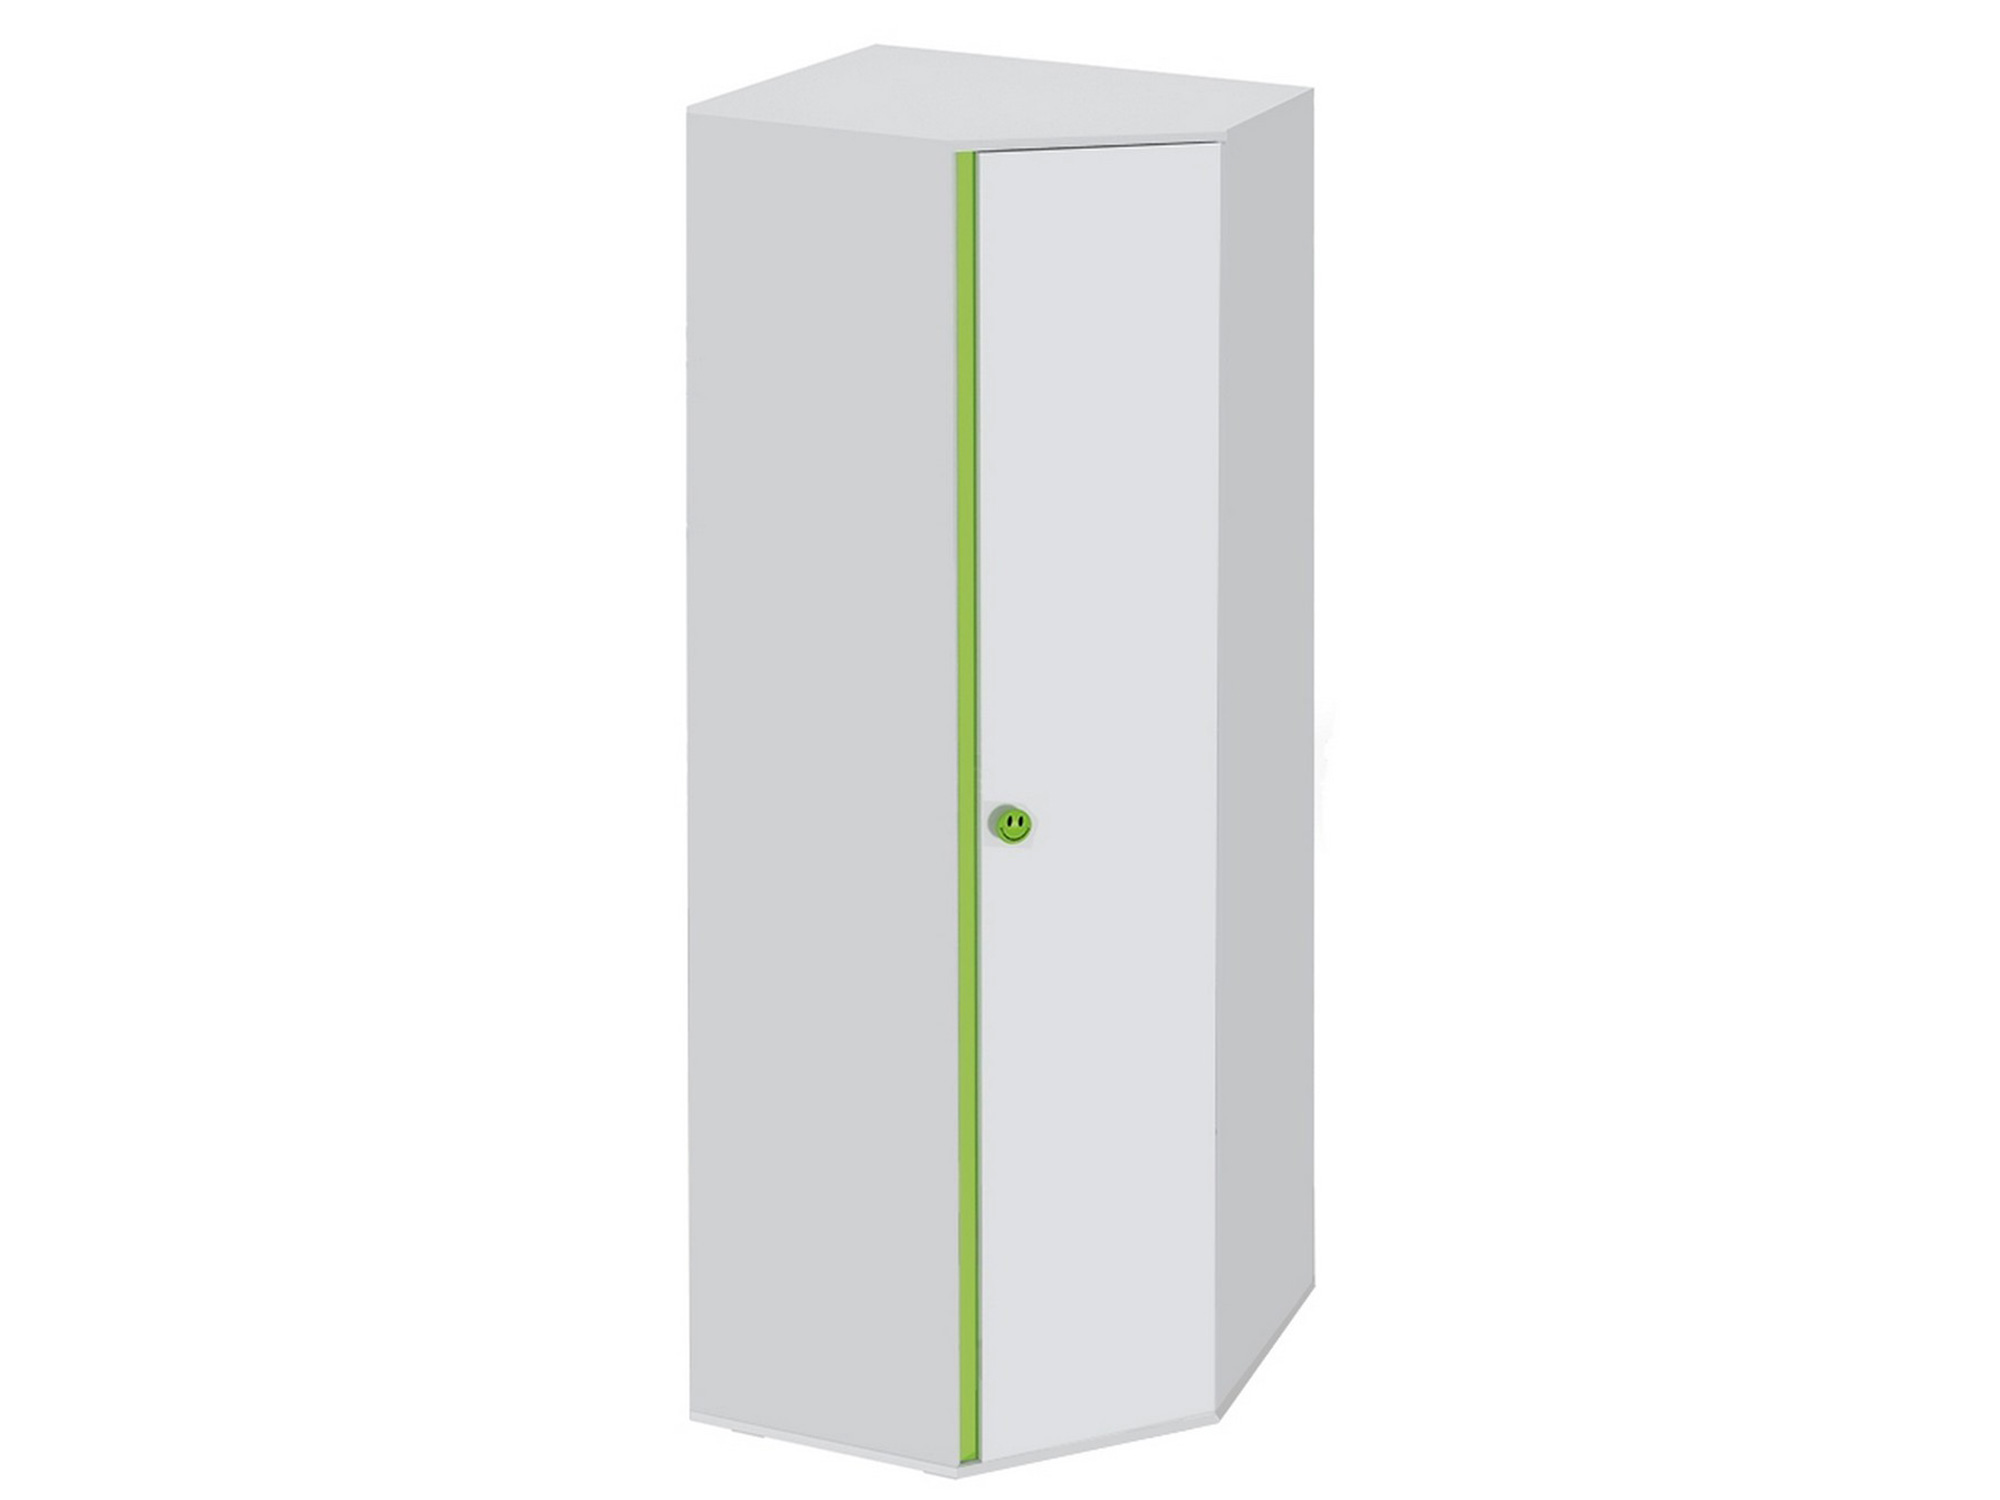 Шкаф угловой Мамба Белый, Зеленый, , ЛДСП Белый, Зеленый